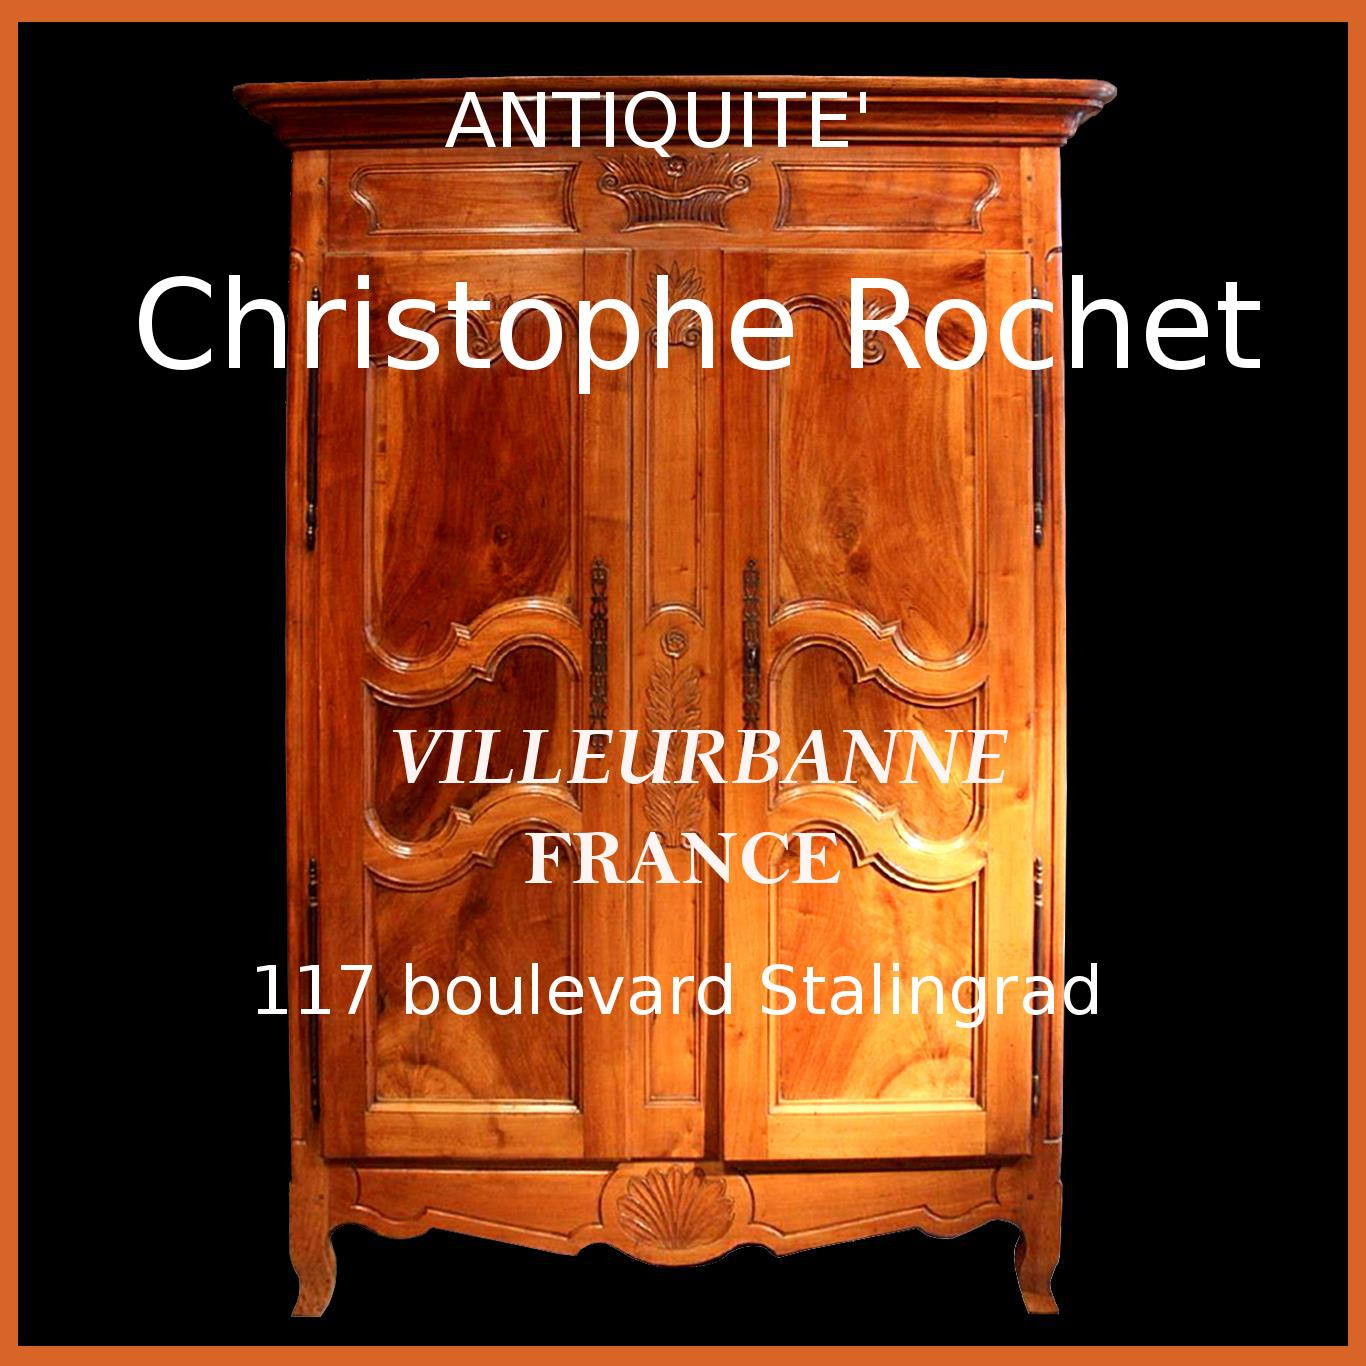 Antiquités Christophe Rochet